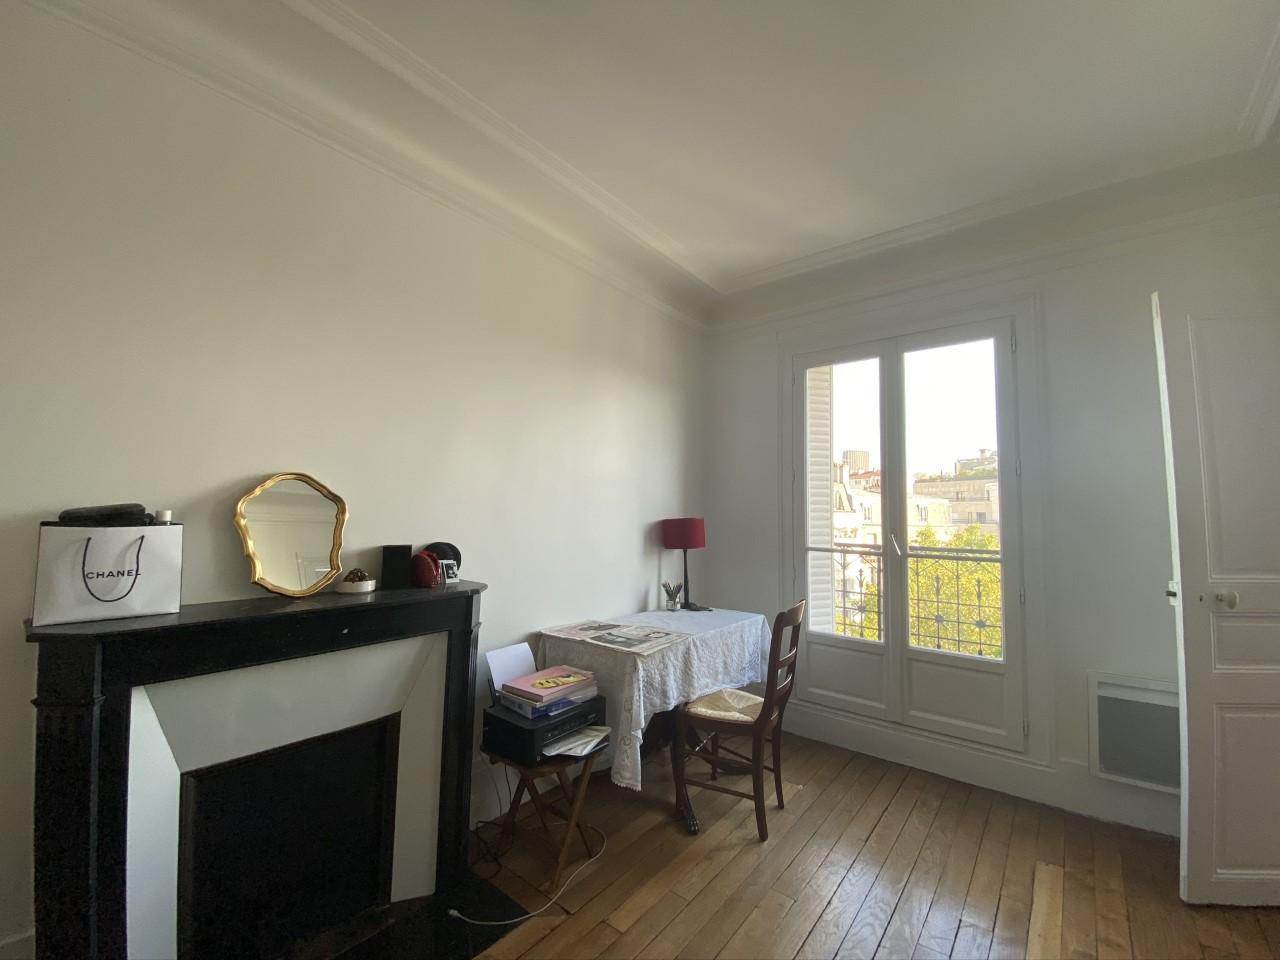 Bedroom office - Chambre bureau